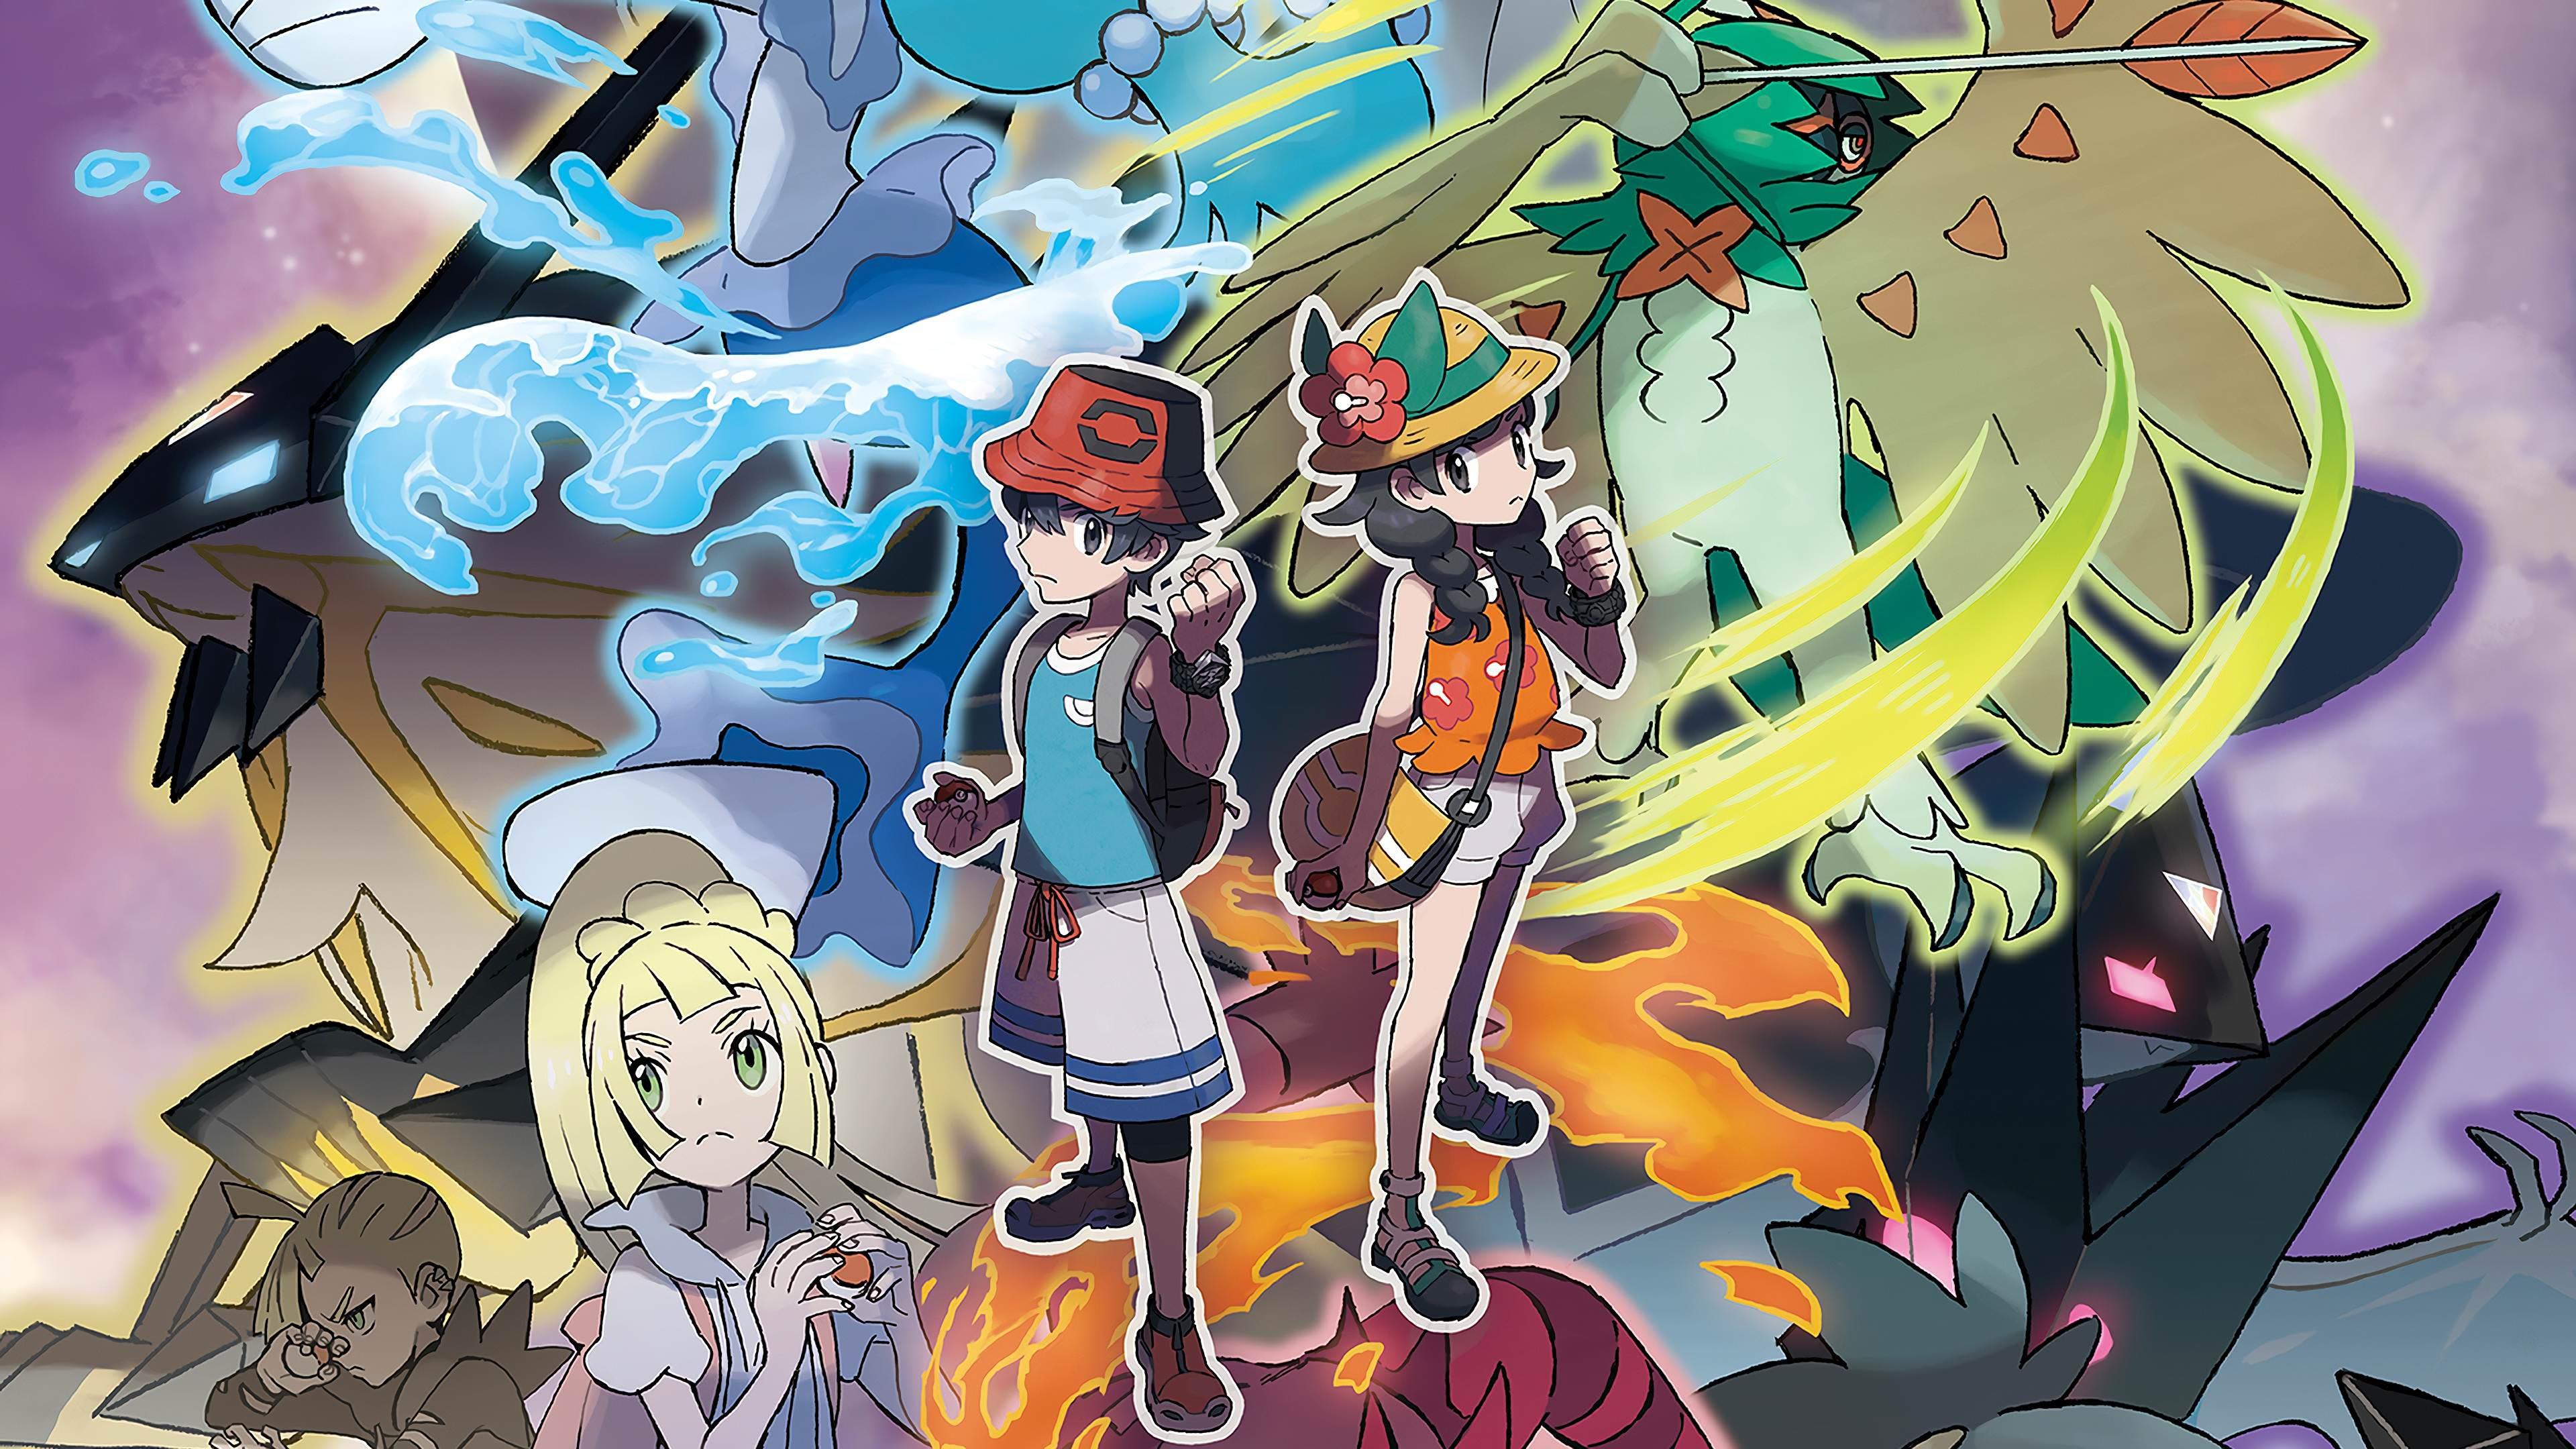 Pokemon Ultra Sun and Moon Wallpapers - Top Free Pokemon ...